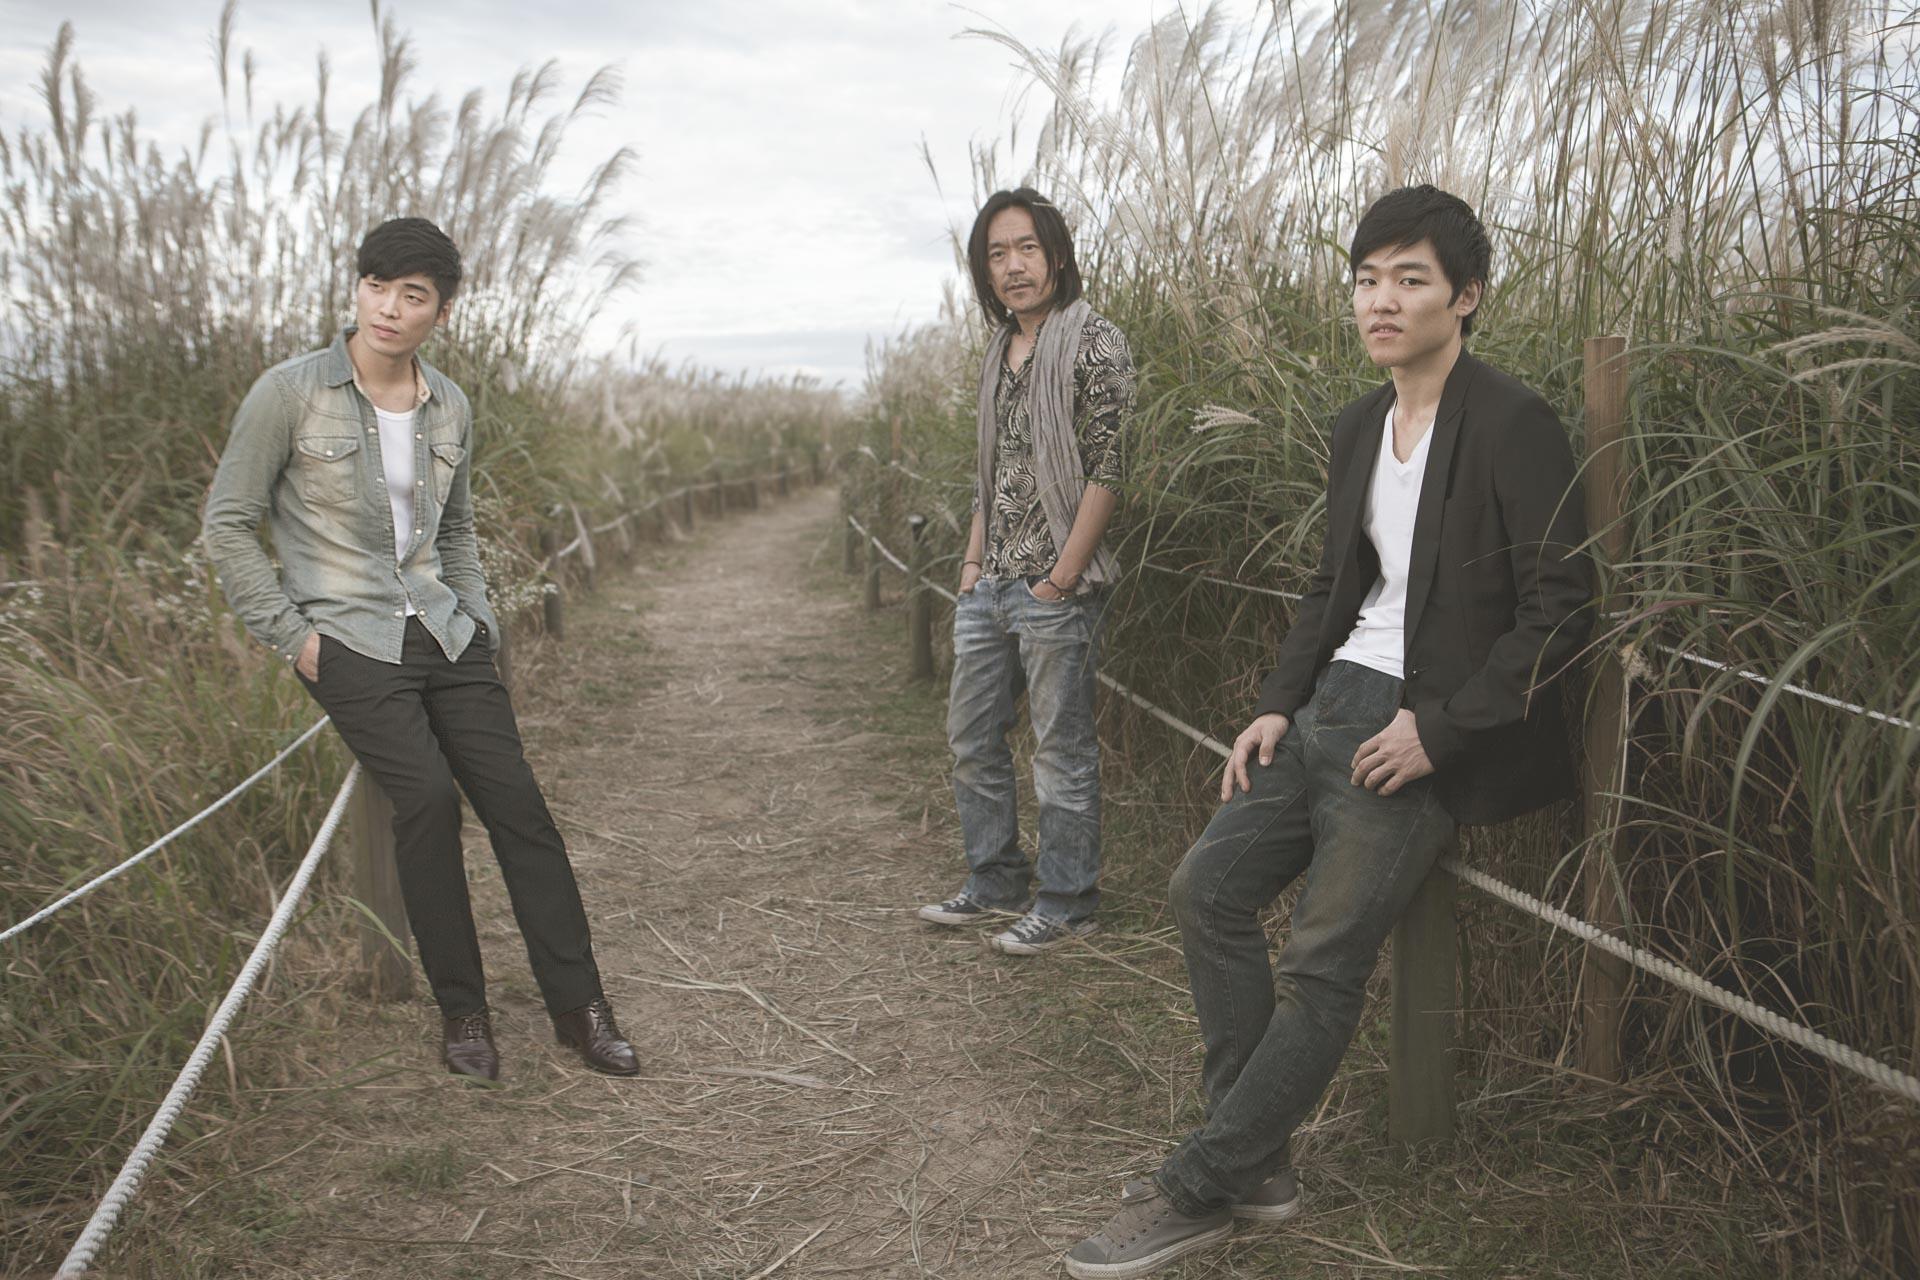 Seoul band photoshoot for The Corona.